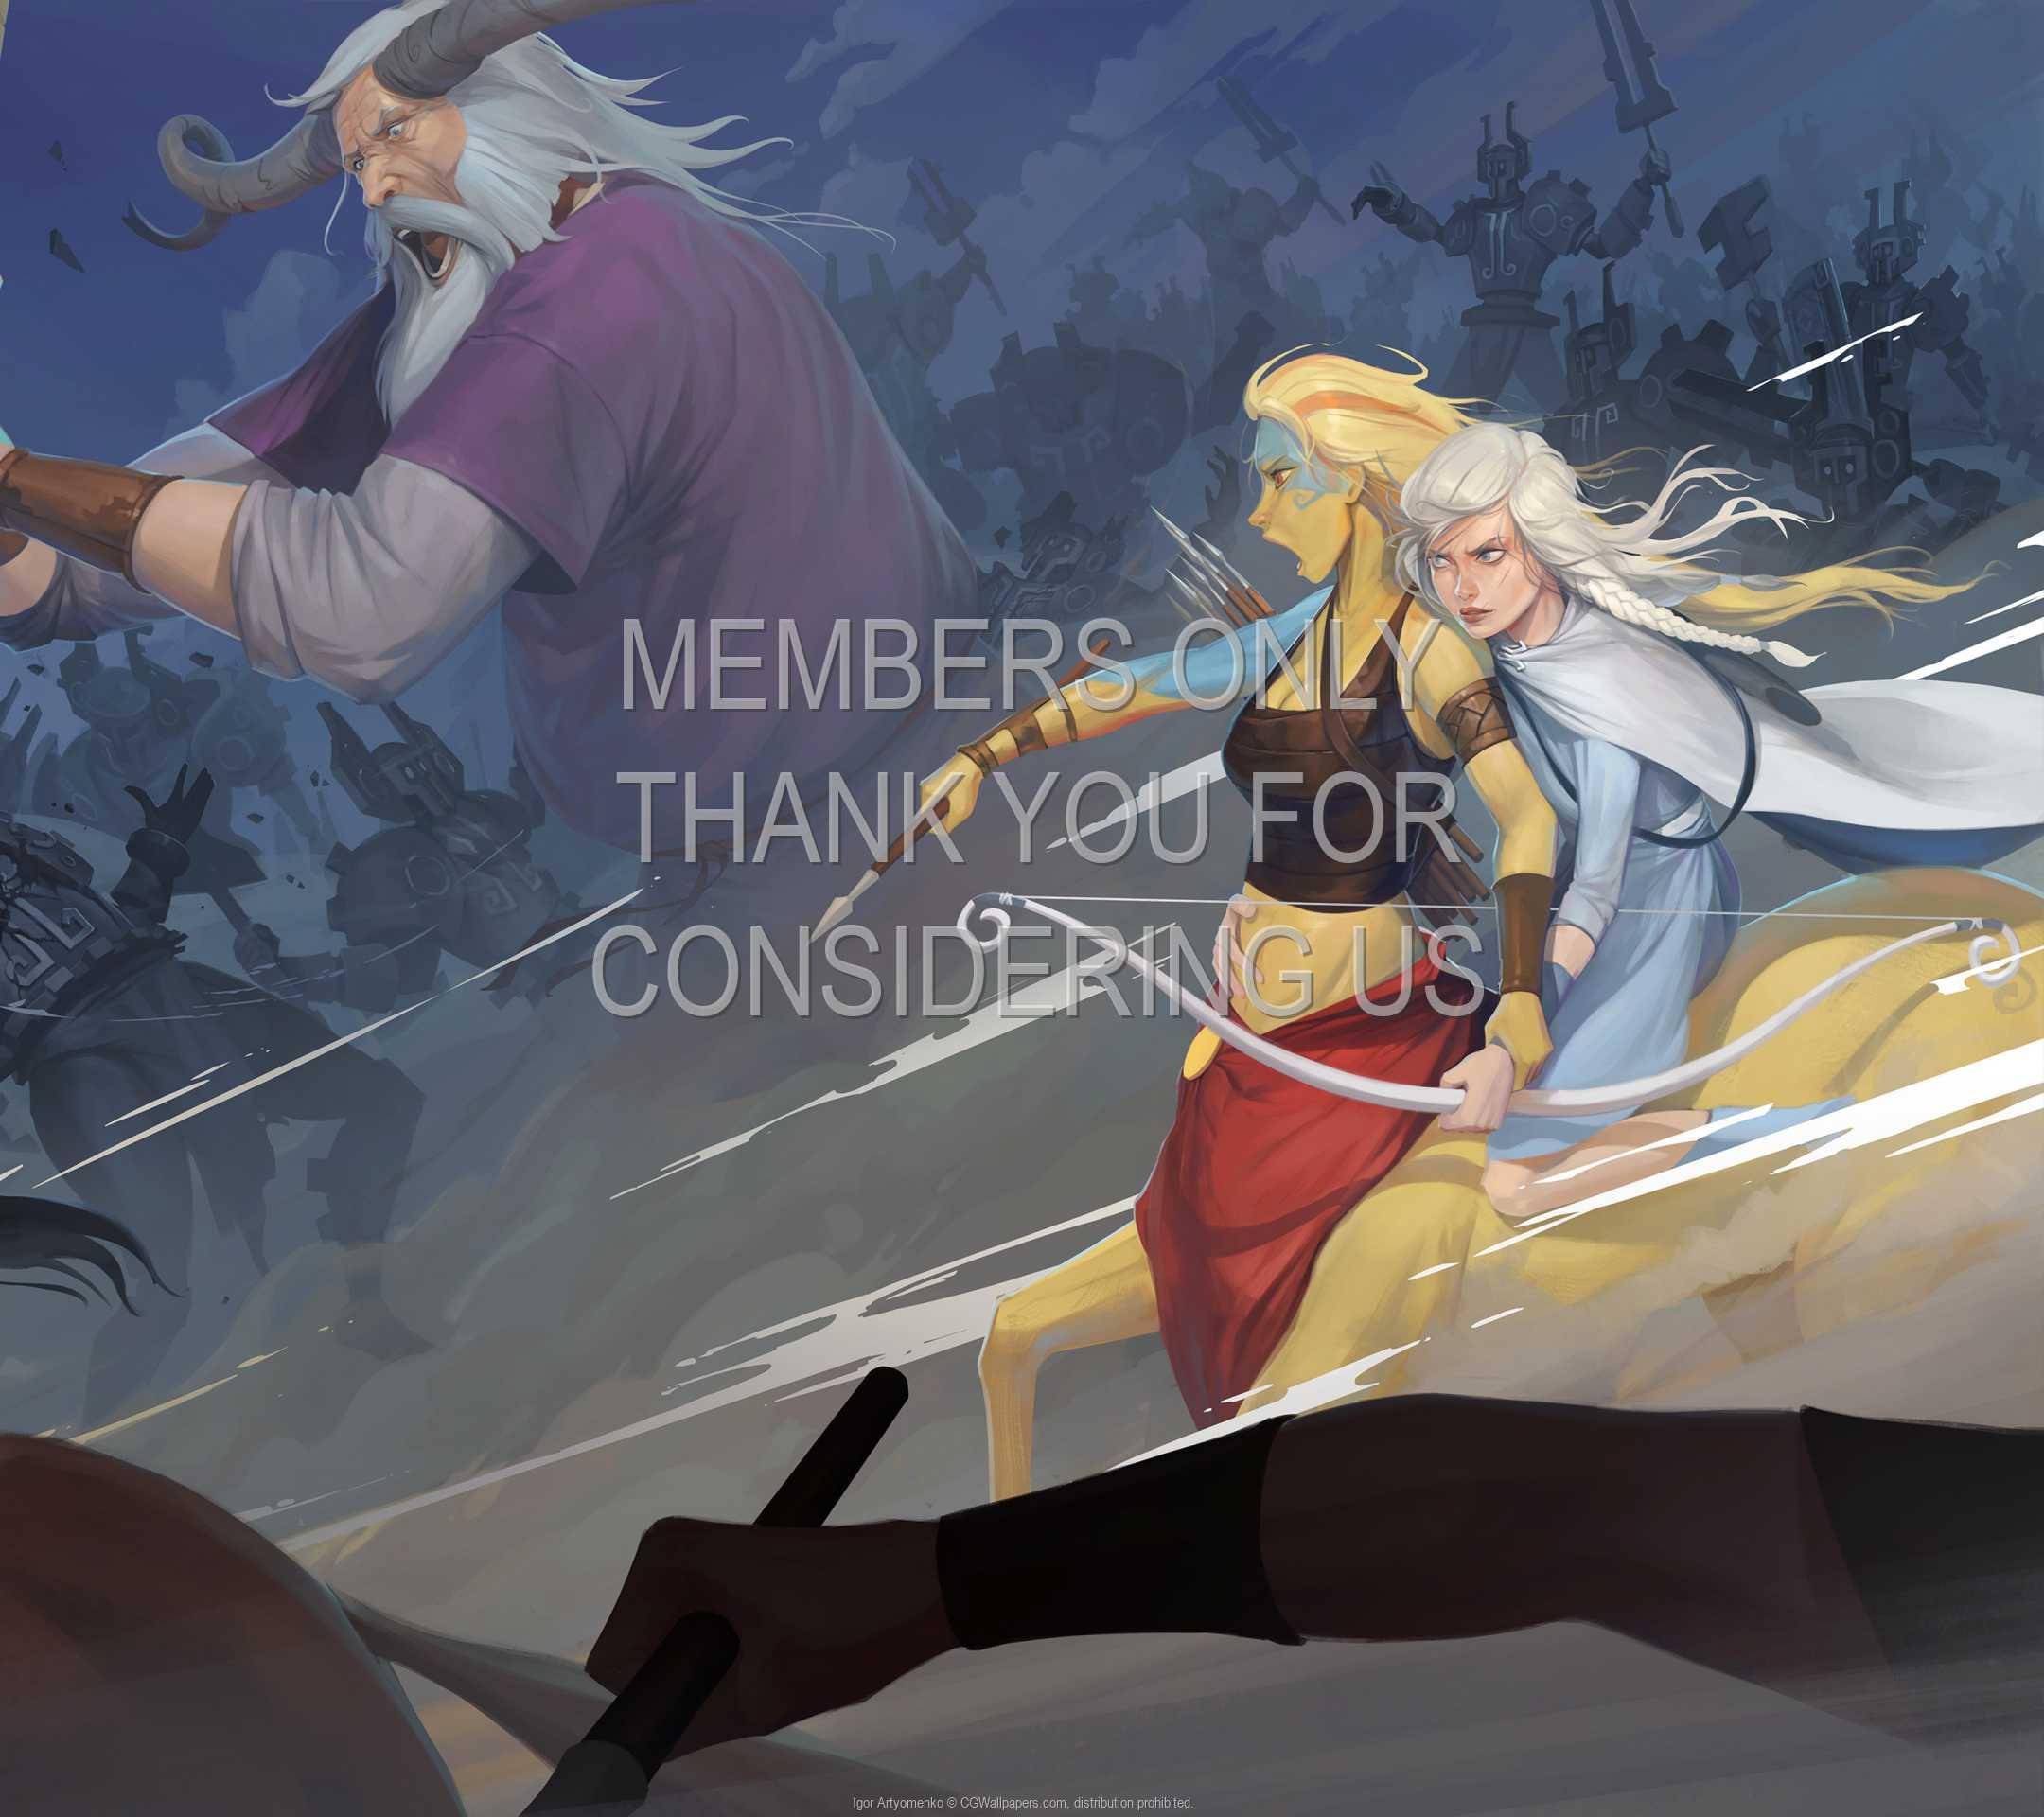 Igor Artyomenko 1080p Horizontal Mobile wallpaper or background 16